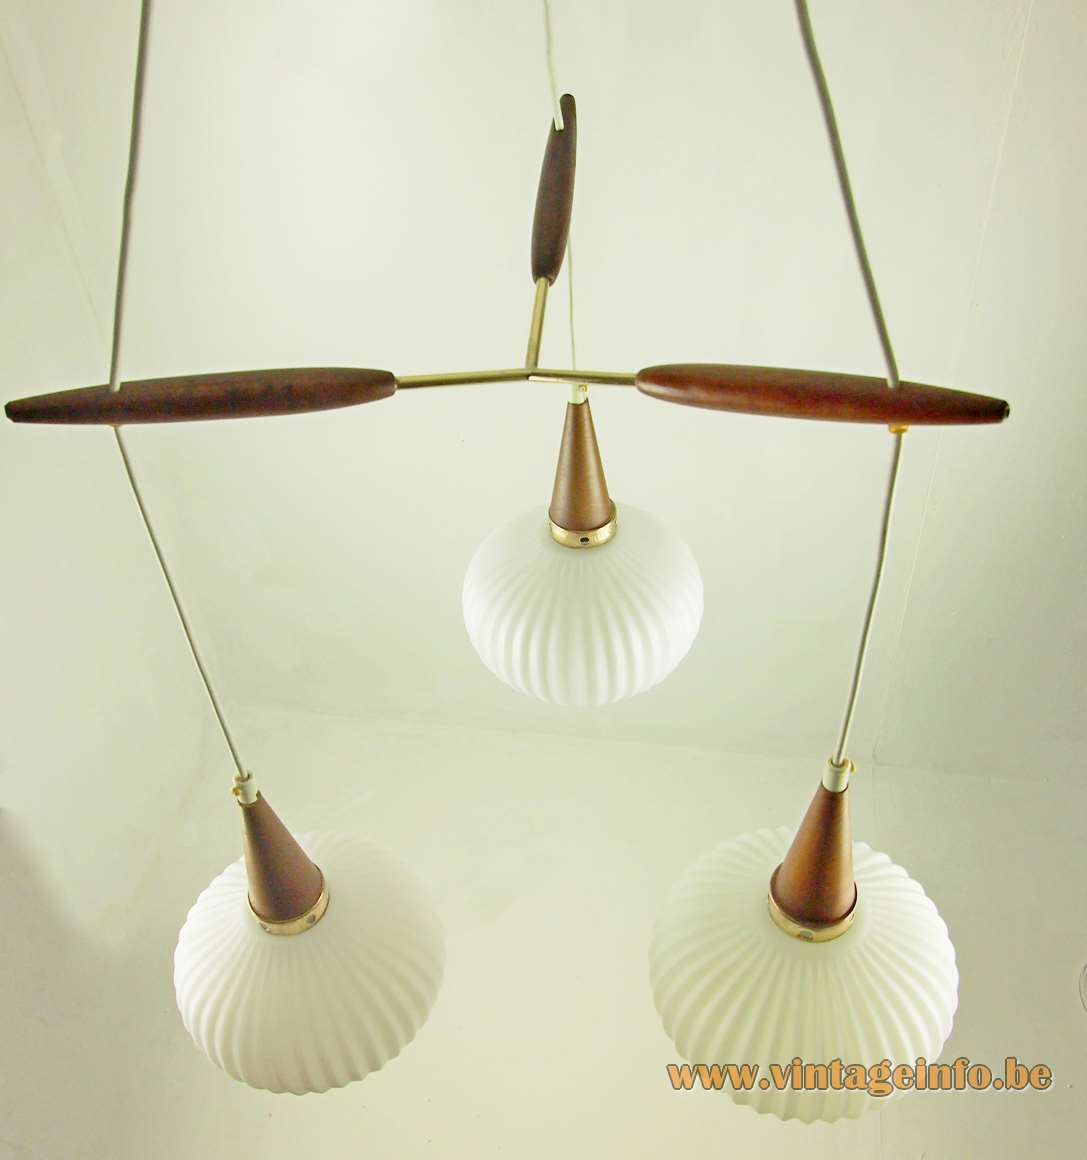 1950s cascade pendant chandelier Louis Kalff Philips style ribbed opal glass wood brass 1960s Massive Belgium